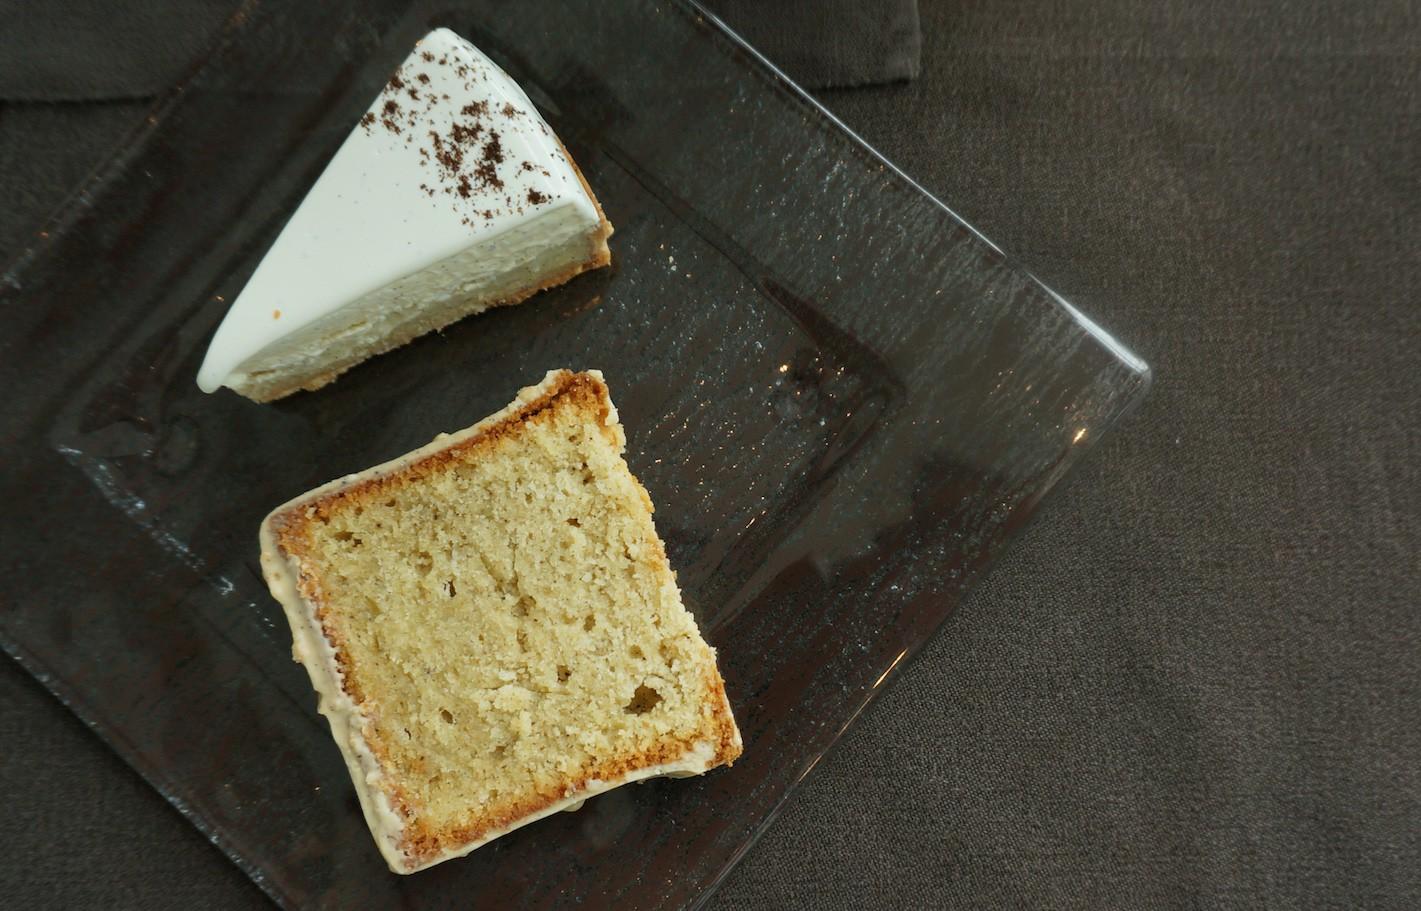 Phoebe S Pastry Cafe Menu